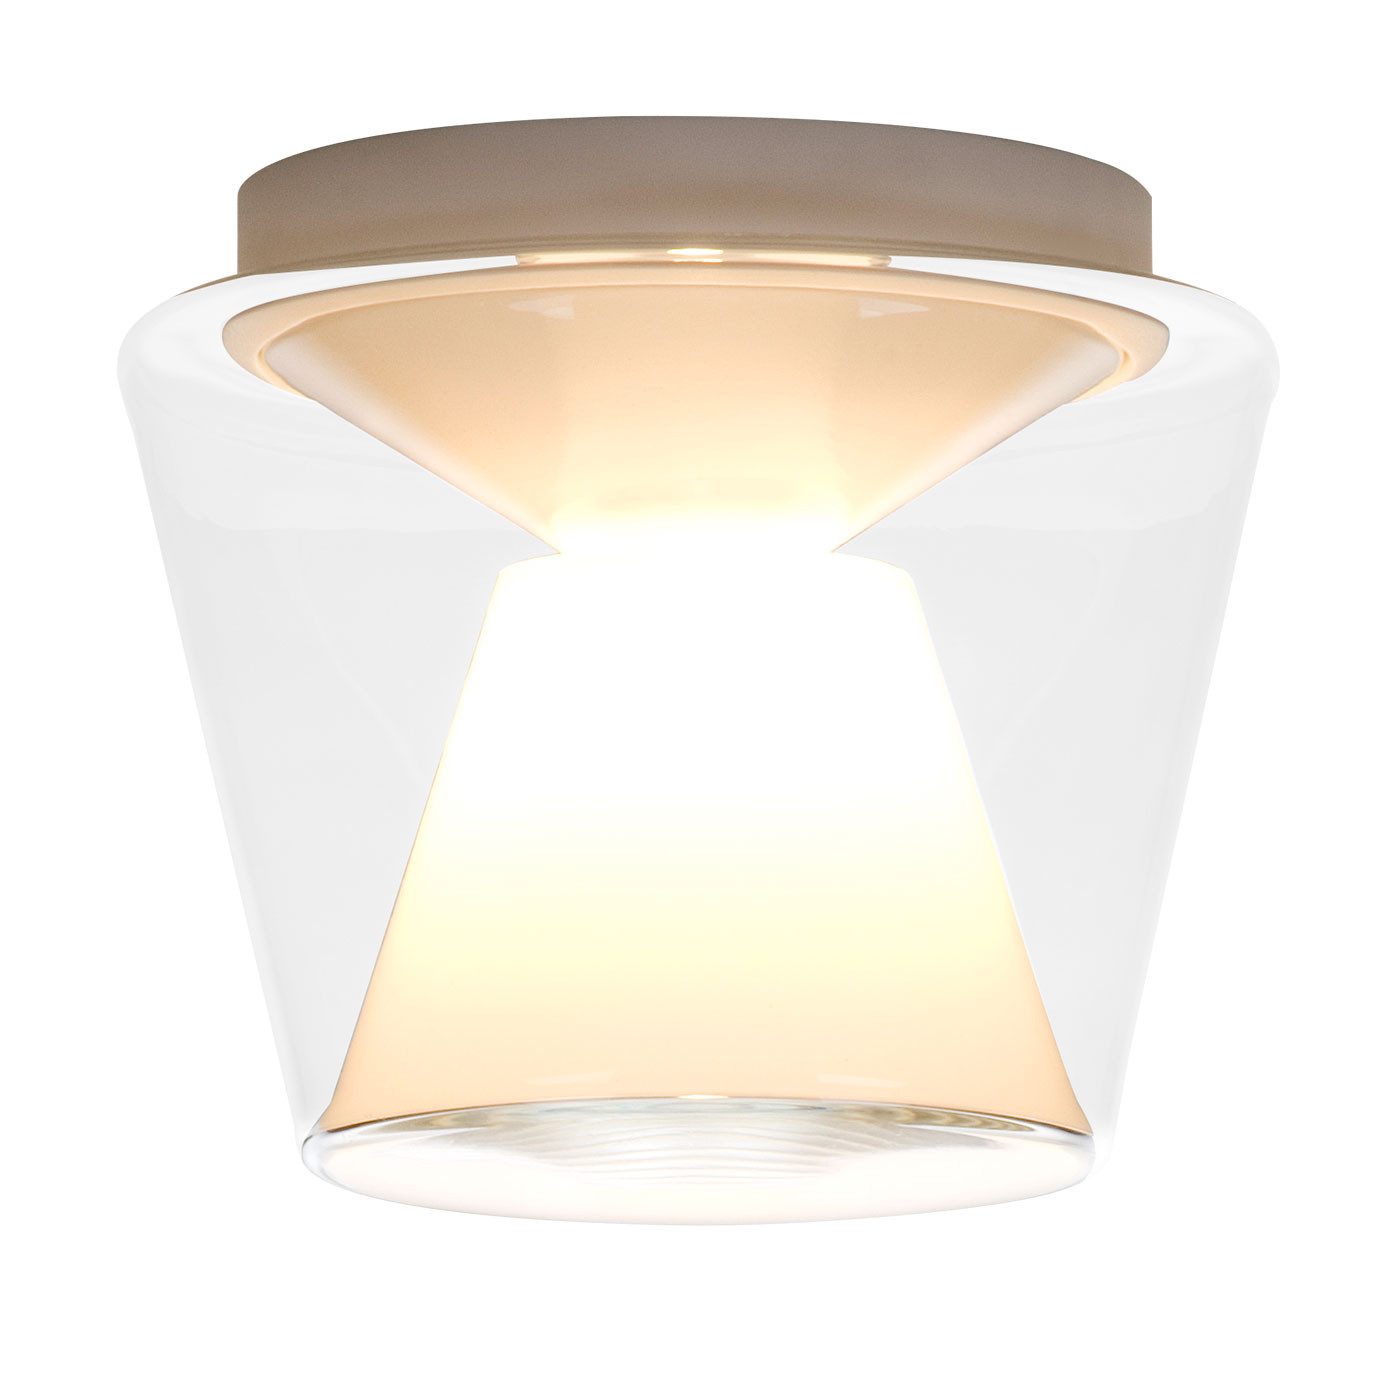 Serien Lighting Annex M 13w Ceiling Light